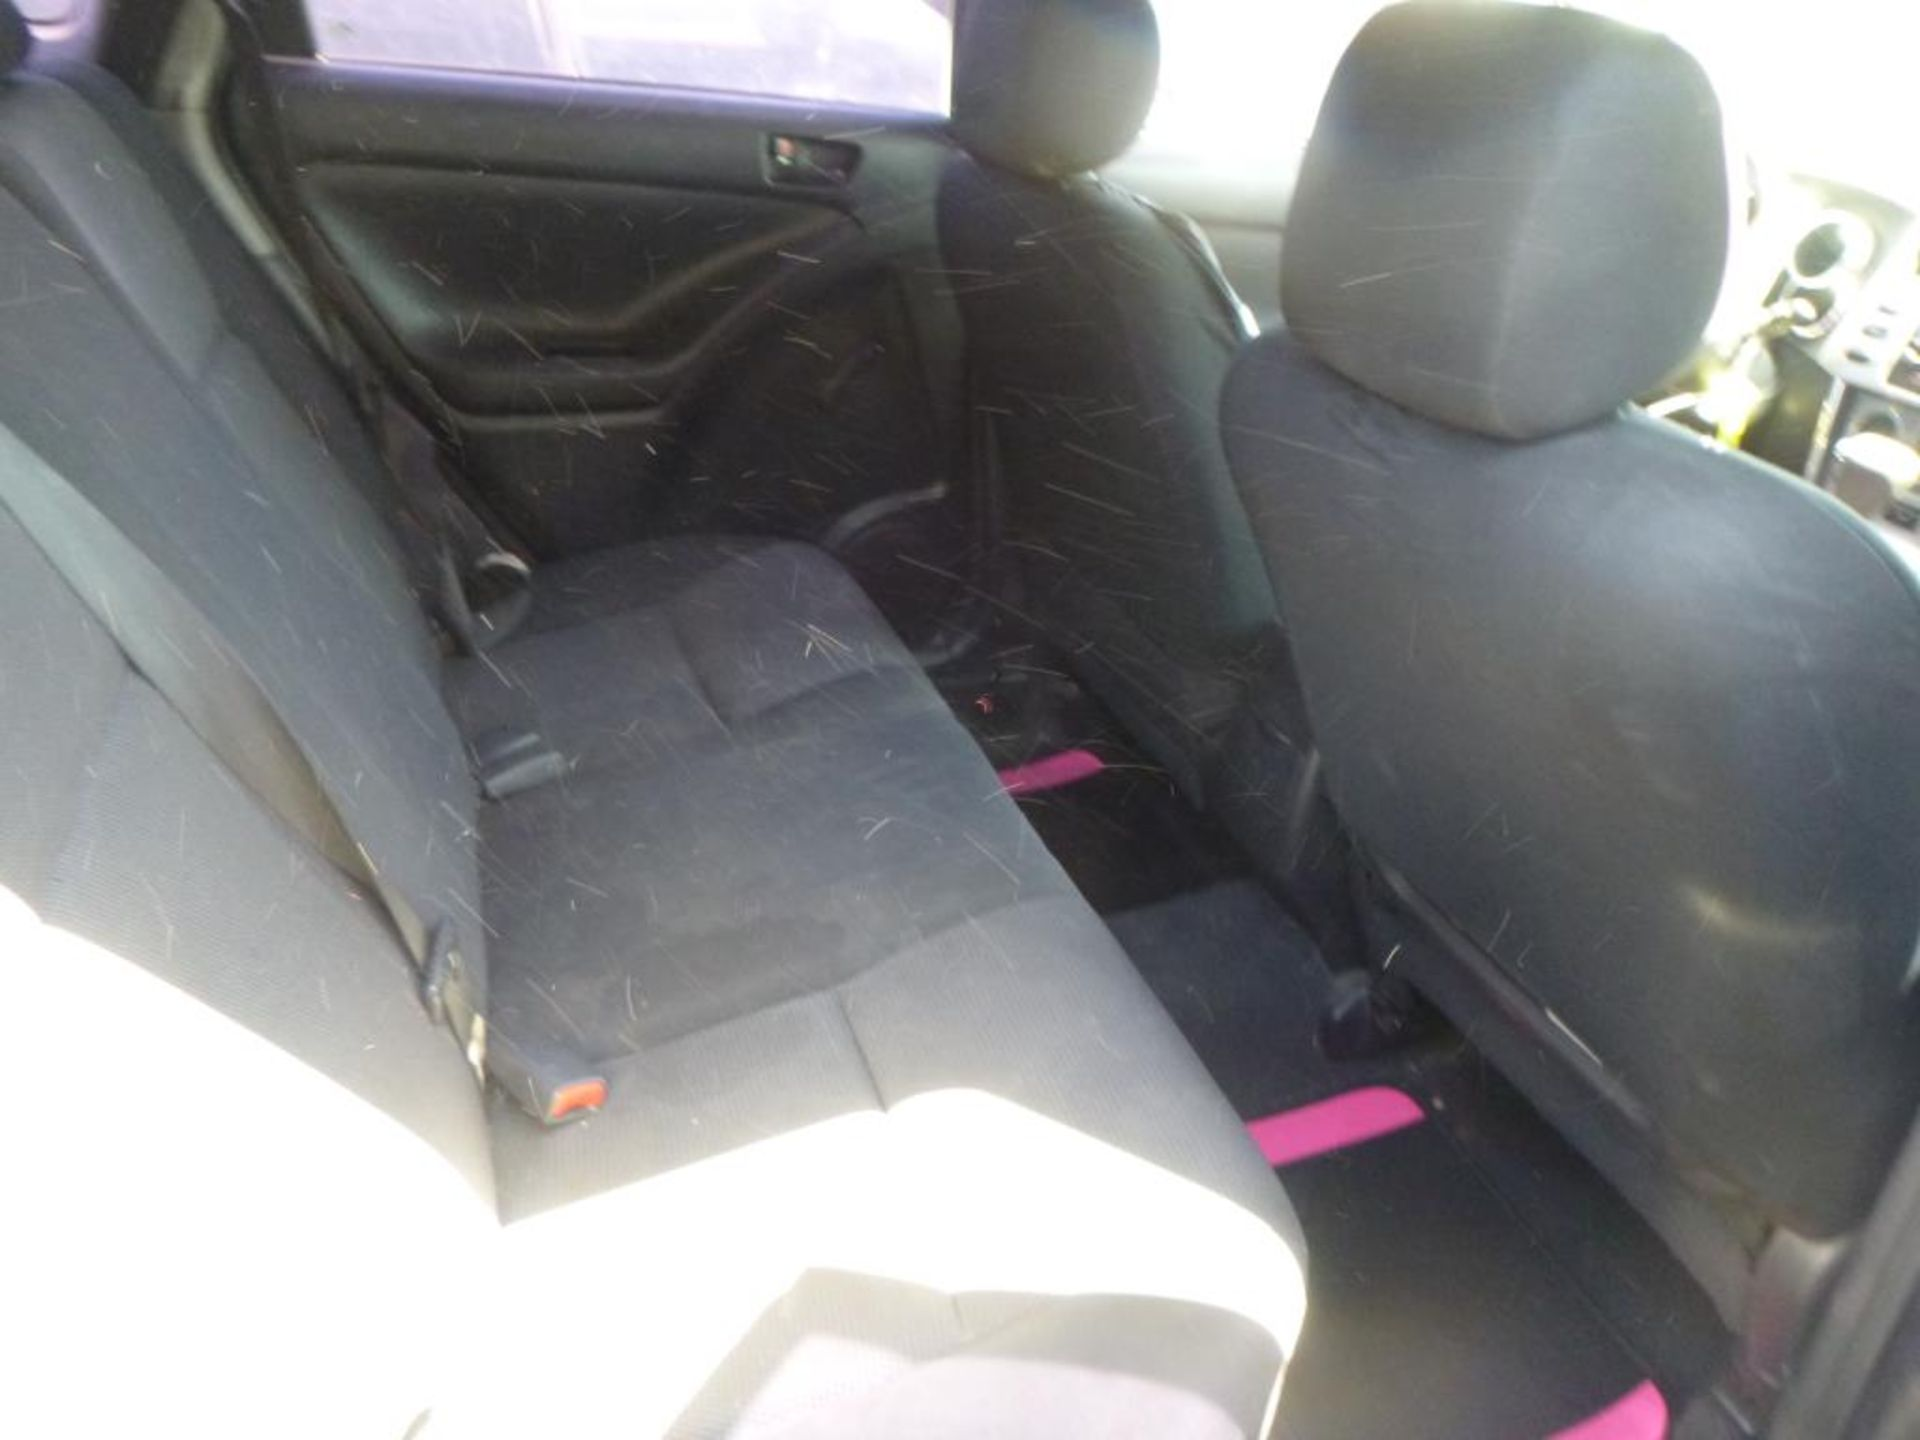 2006 Pontiac Vibe - Image 8 of 14